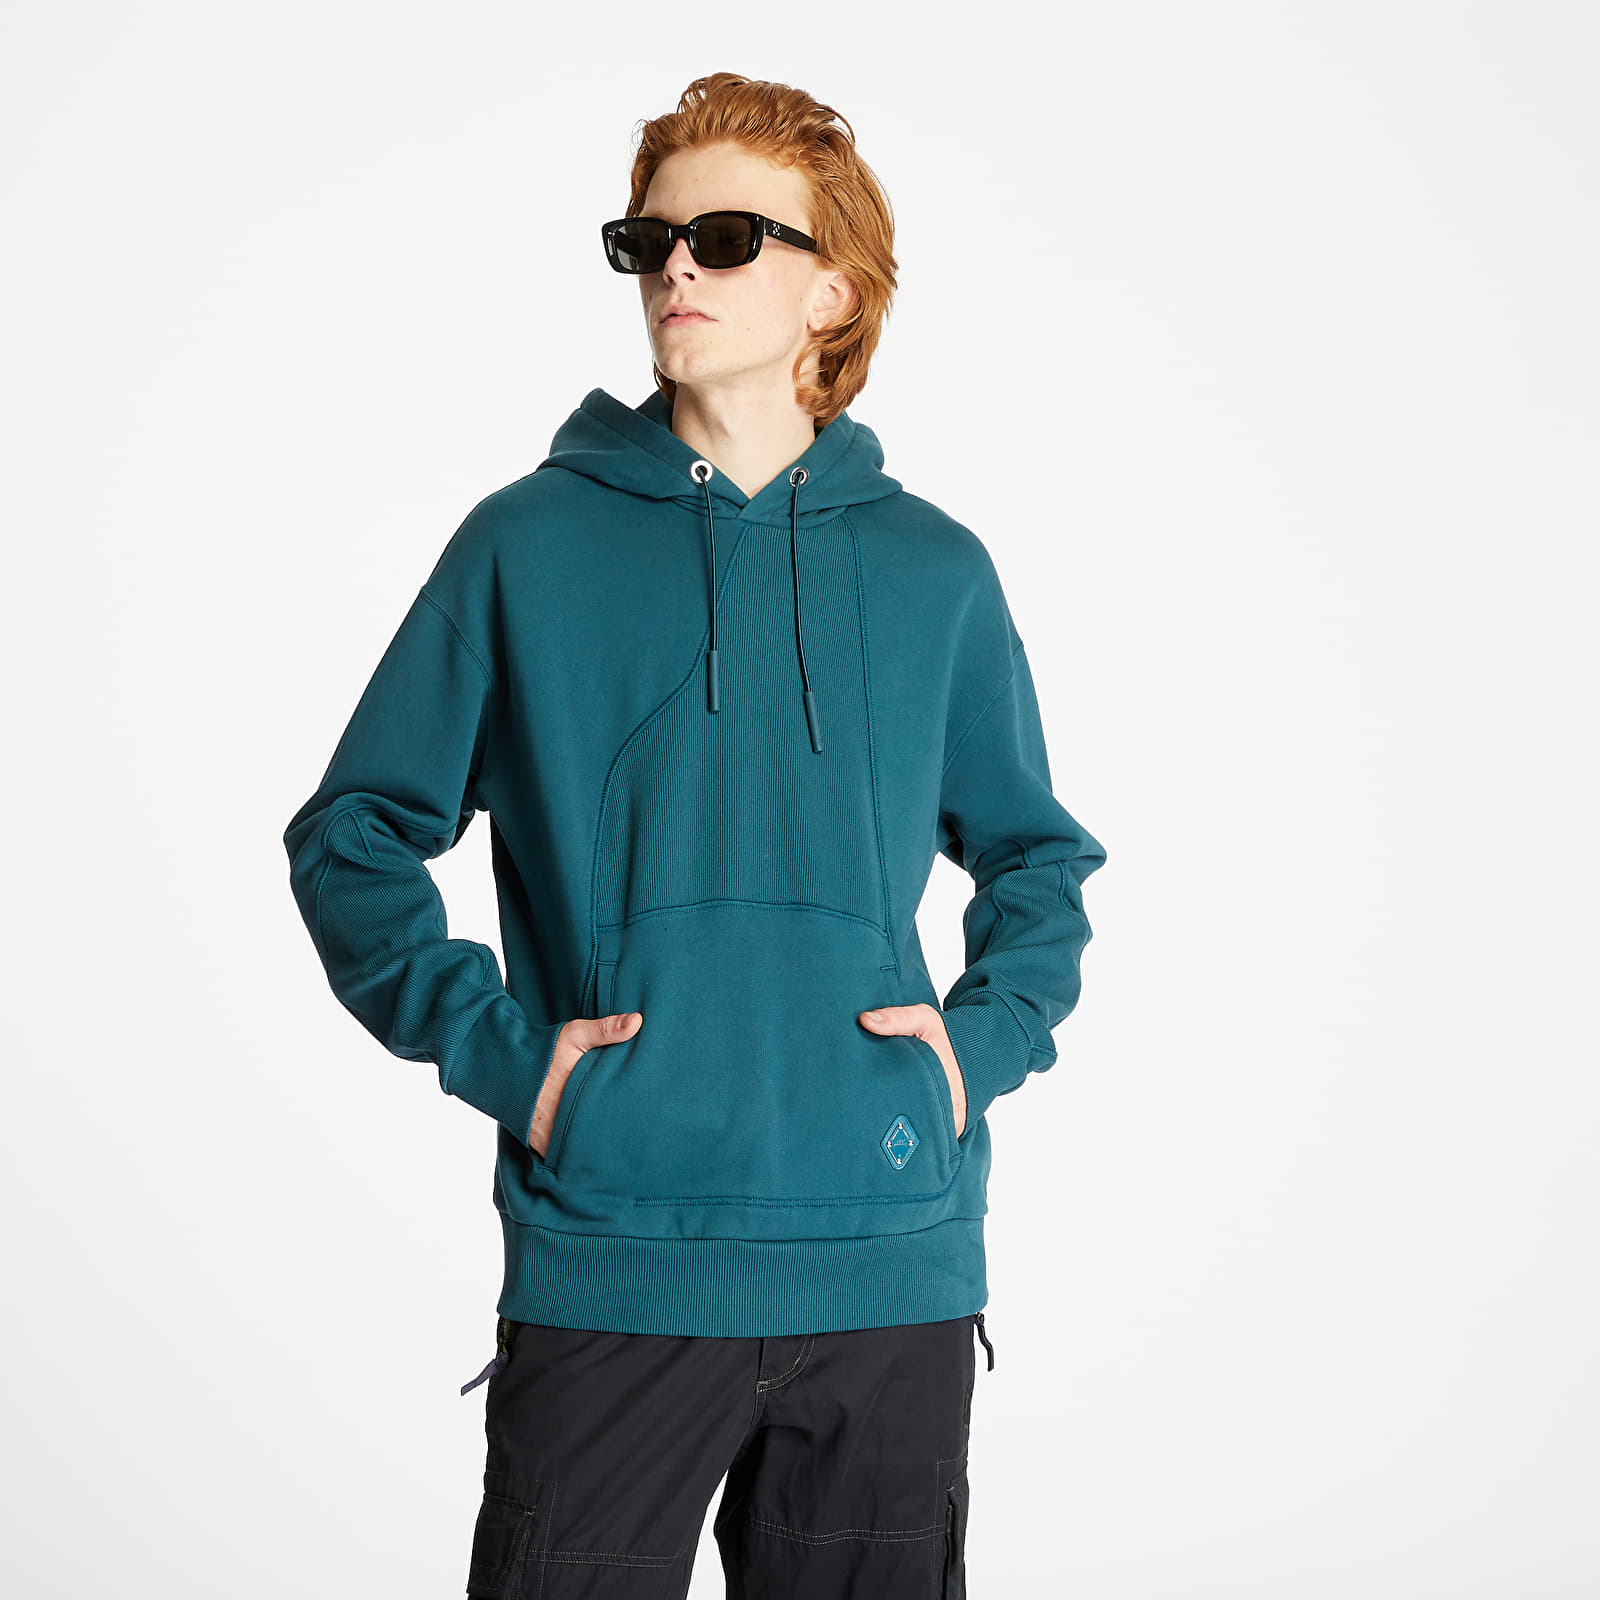 Sweatshirts A-COLD-WALL* Contour Hoodie Atlantic